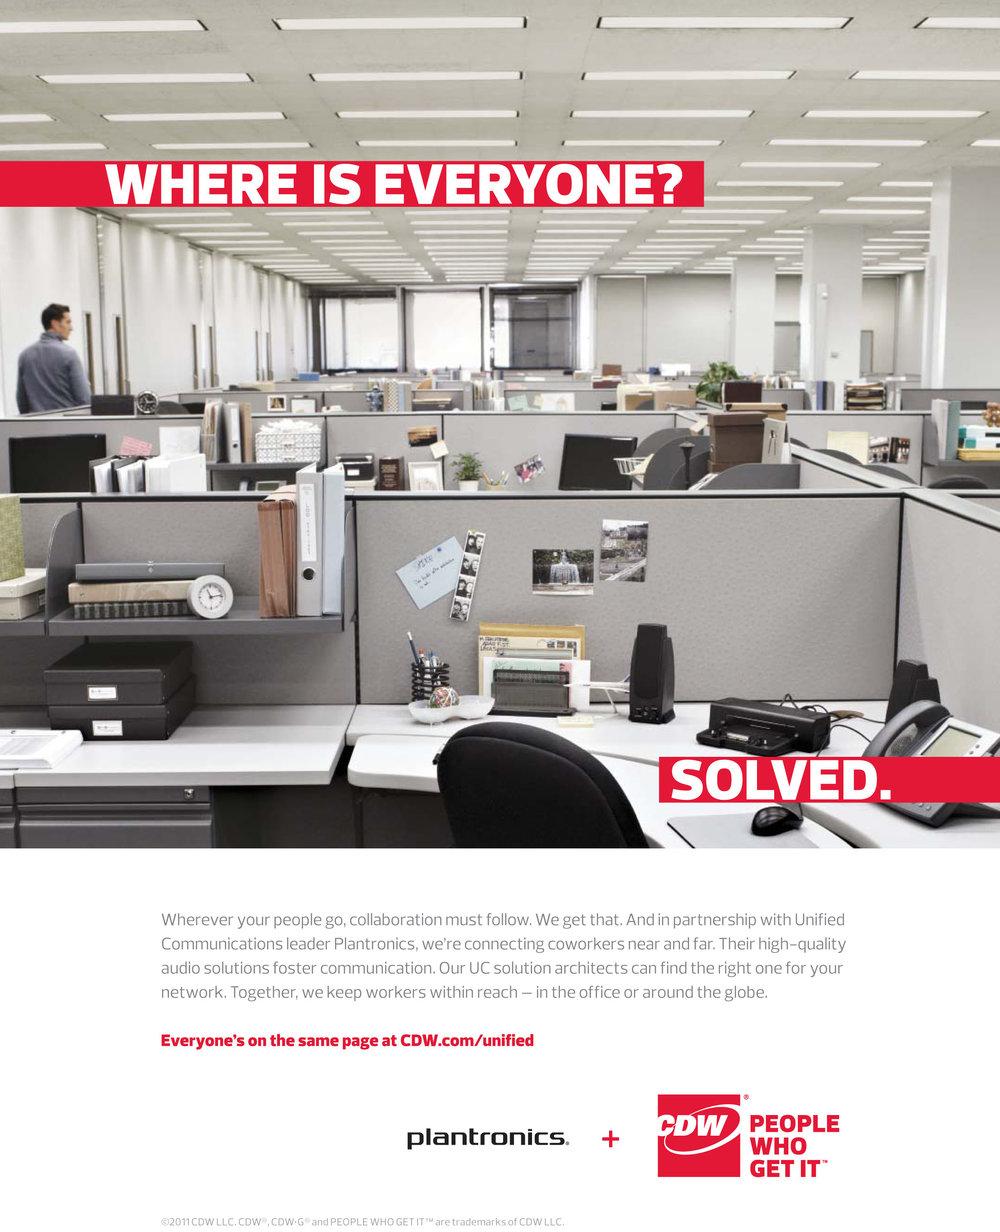 CDW_Print_Where is everyone.jpg